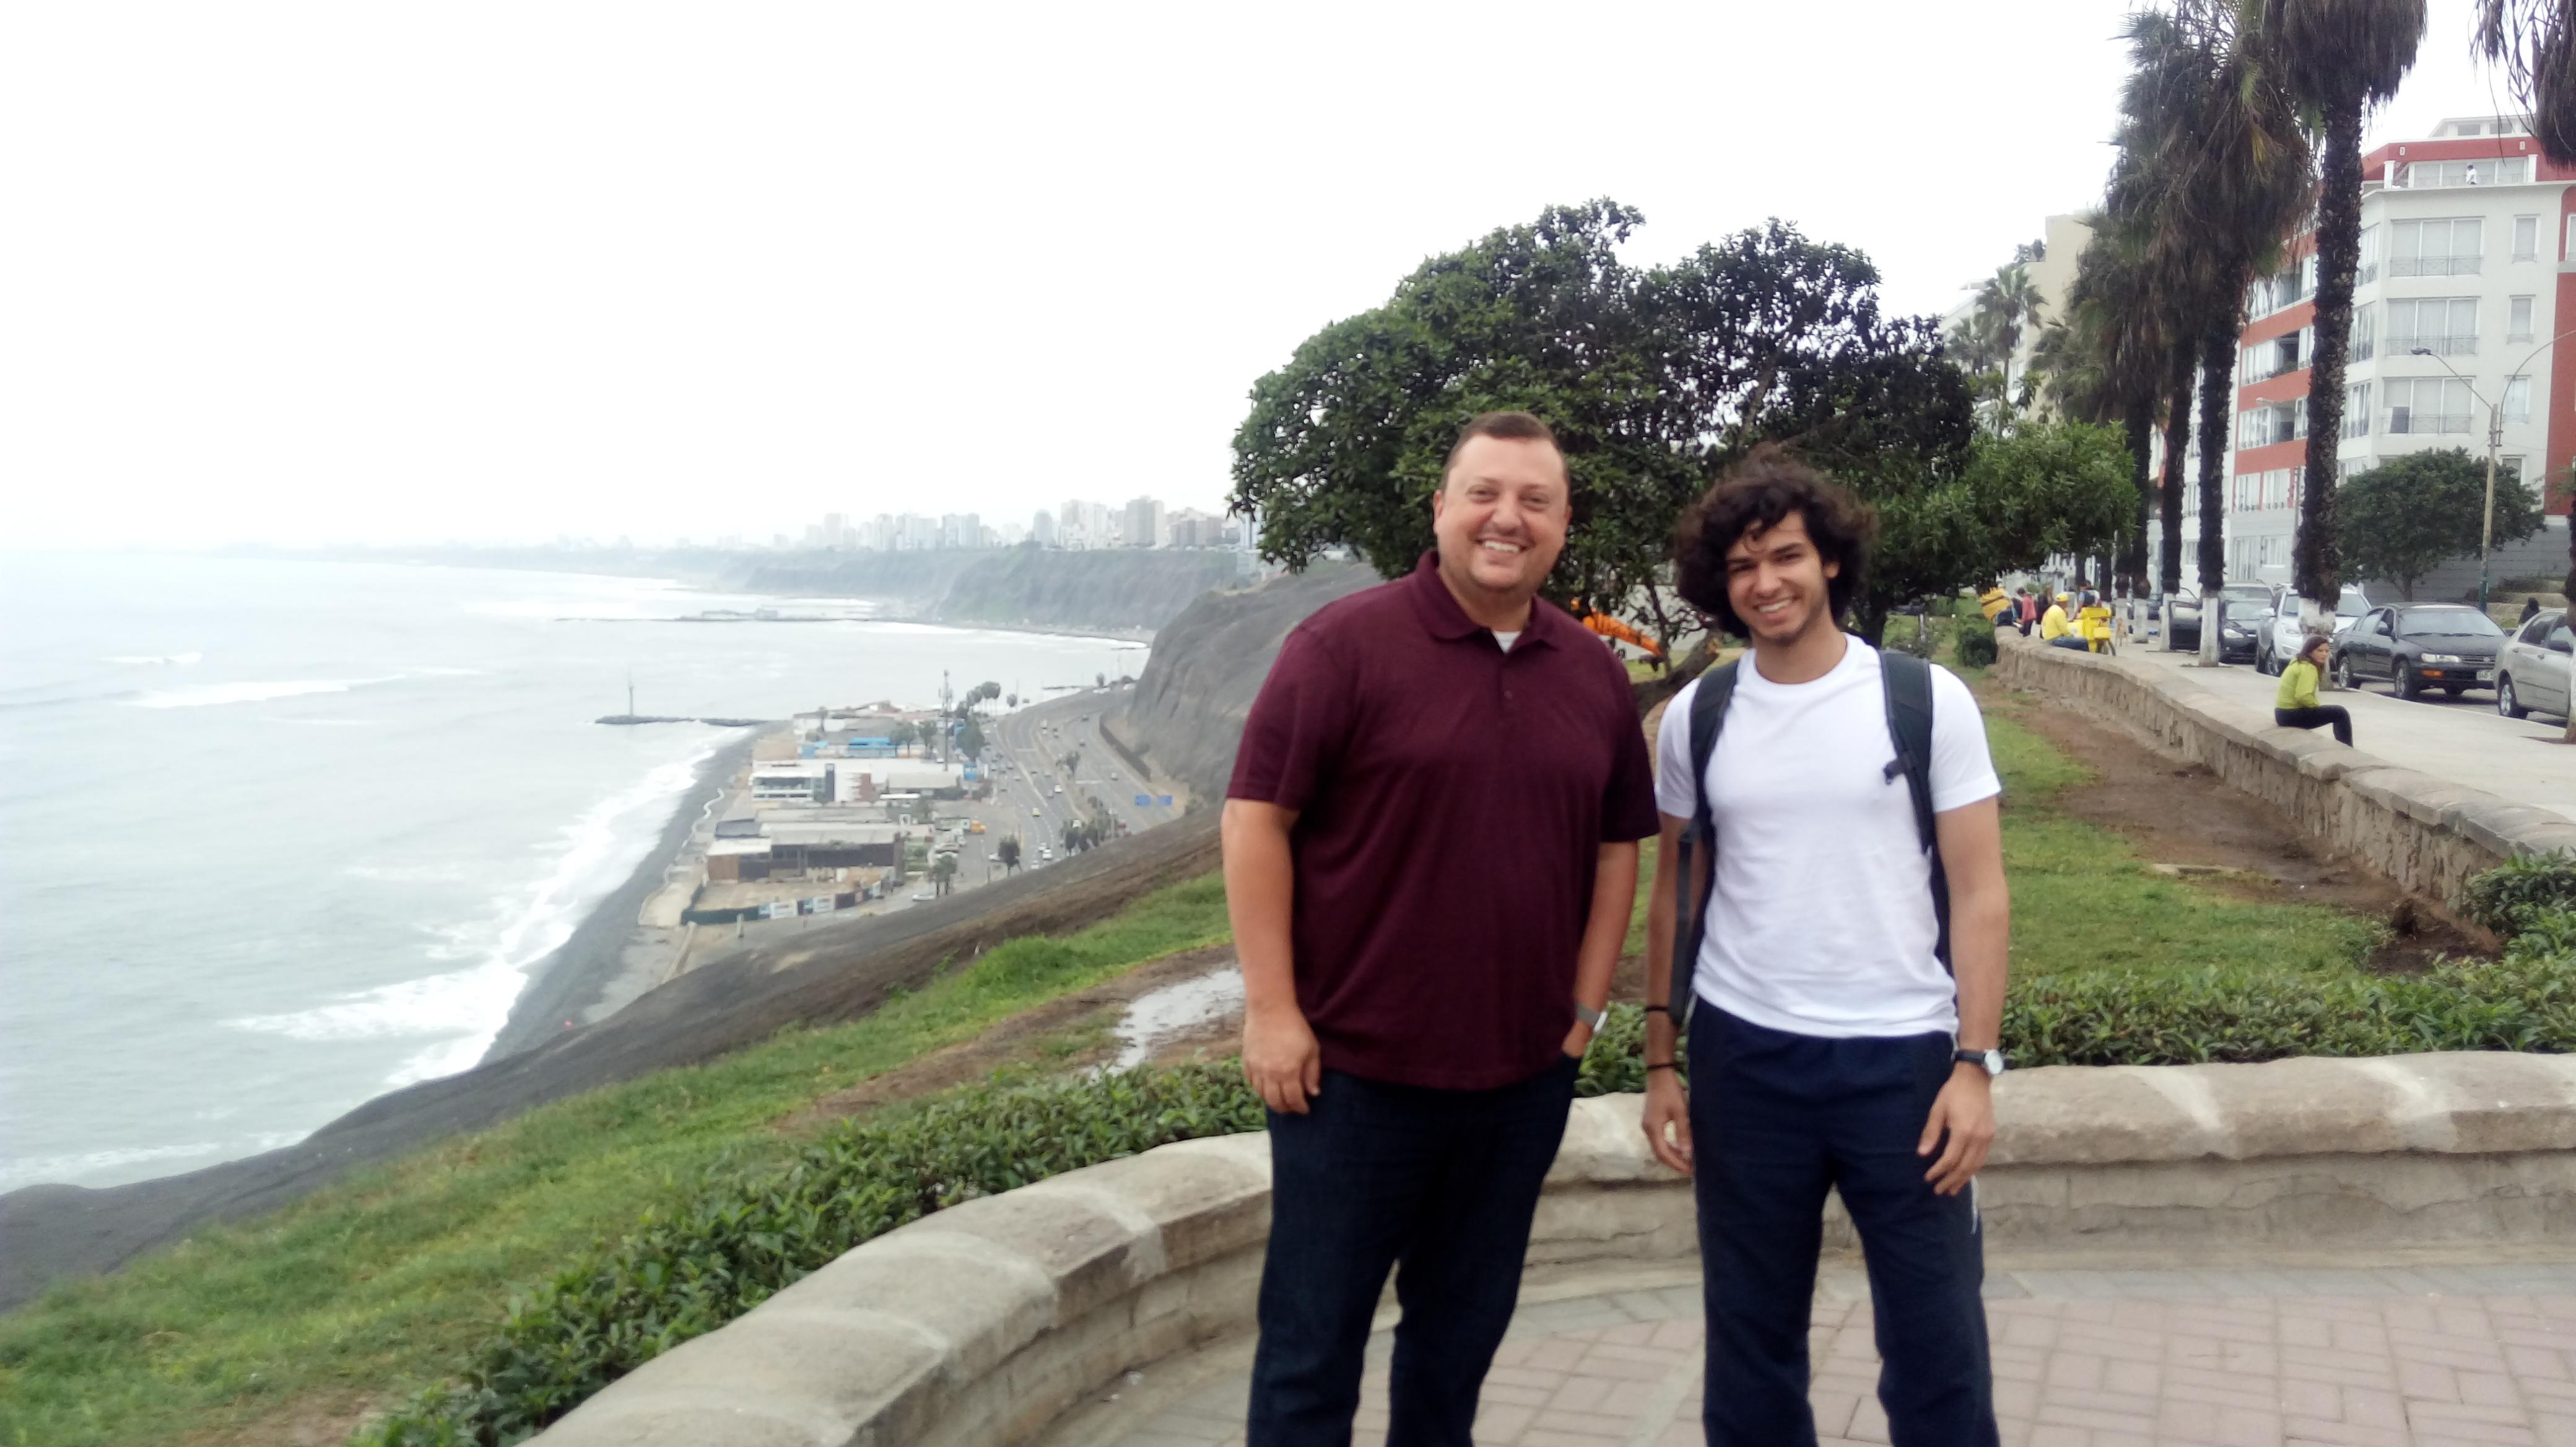 Jeremy and Varun on the malecon on Miraflores, Lima.